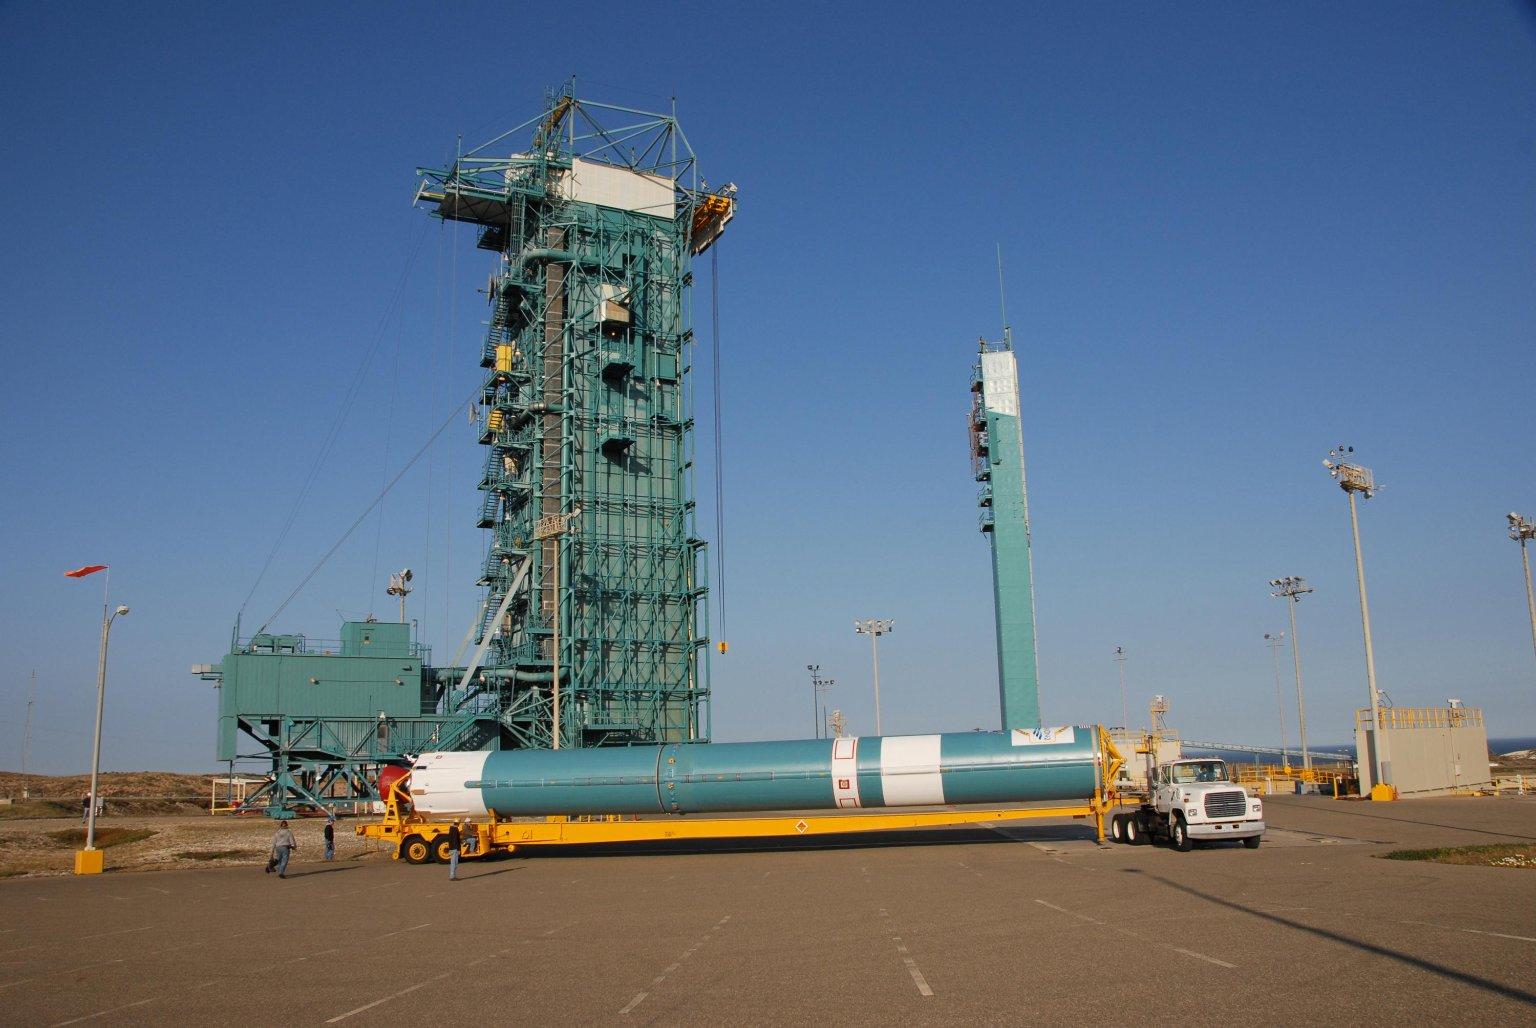 Delta Reaches Launch Pad